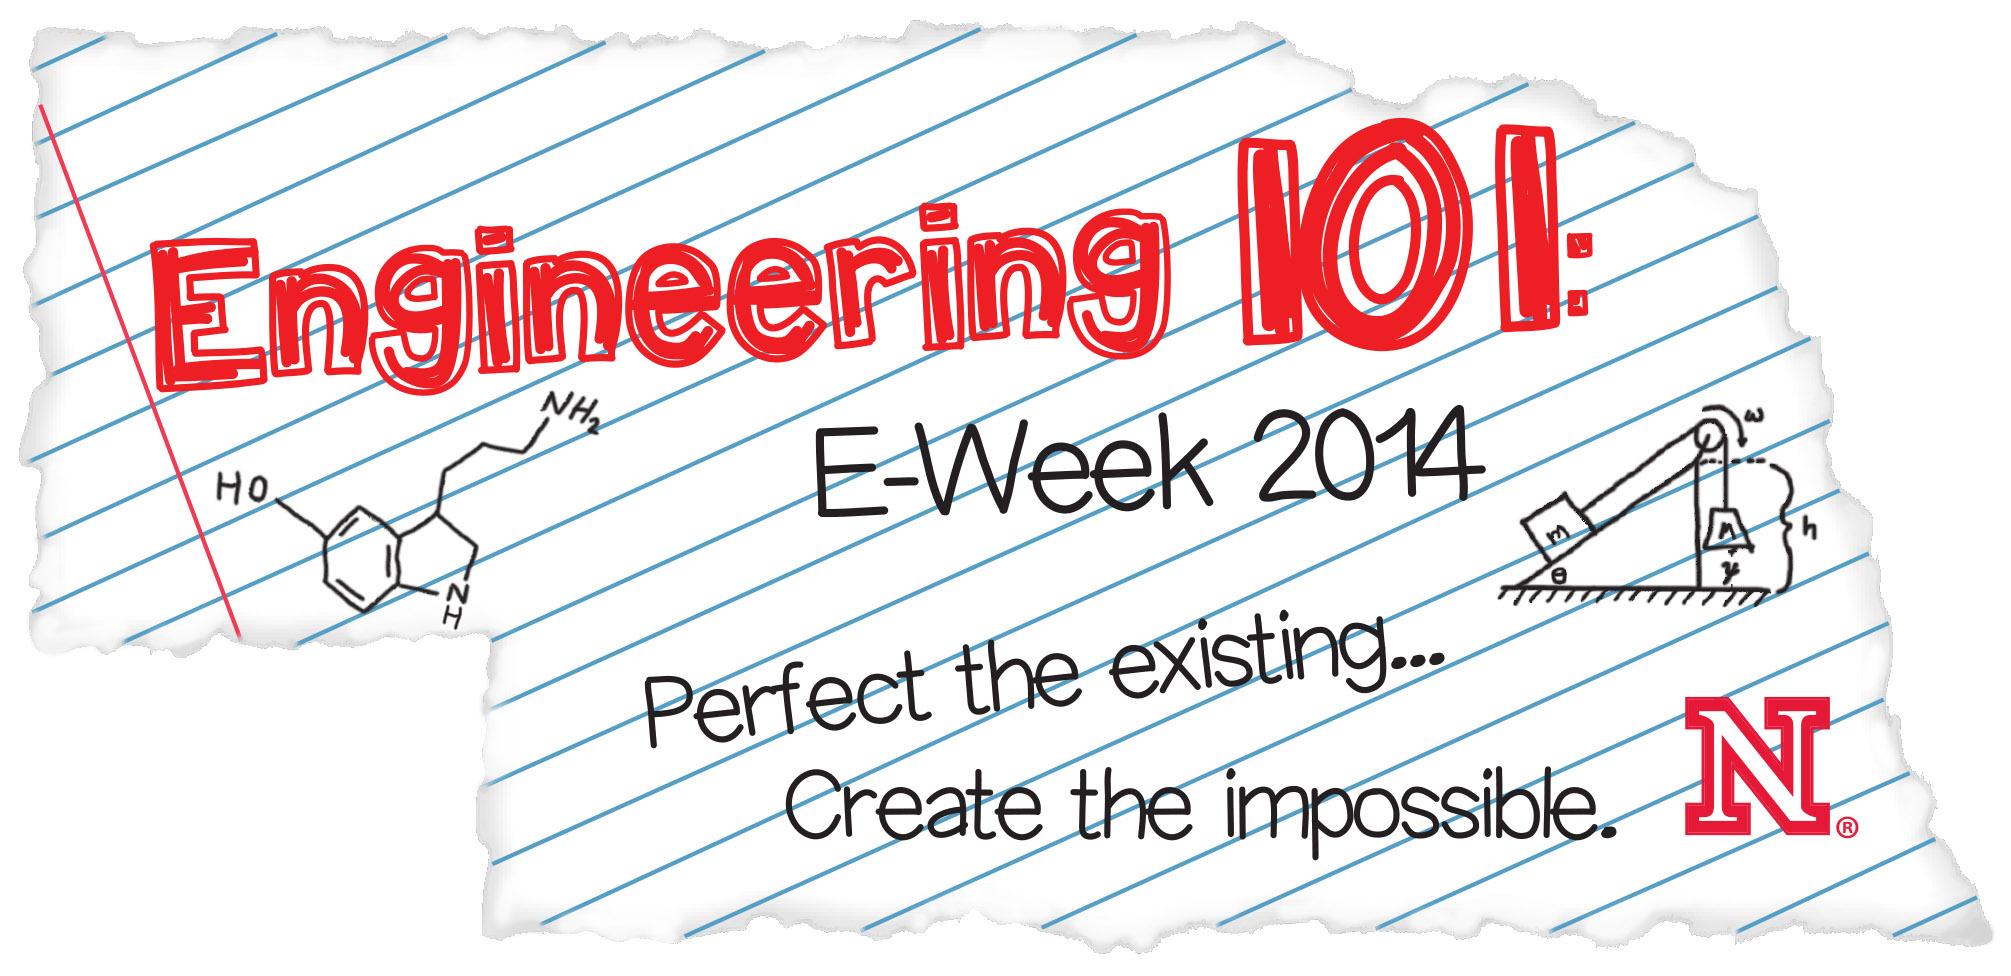 Engineering 101: E-Week 2014 - State of Nebraska image